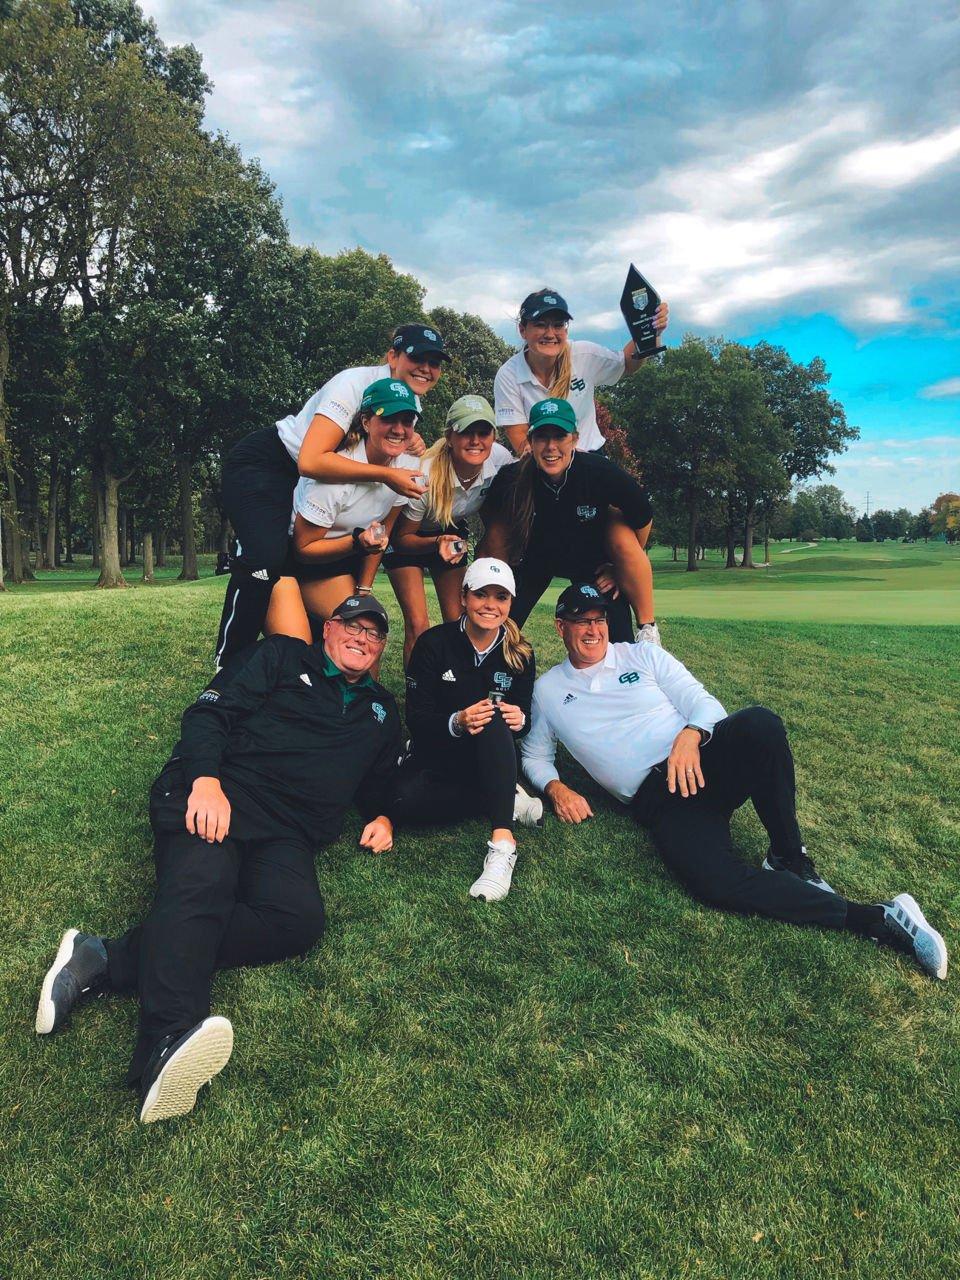 UW-Green Bay women's golf team | 2019 Mastodon Fall Invite champs